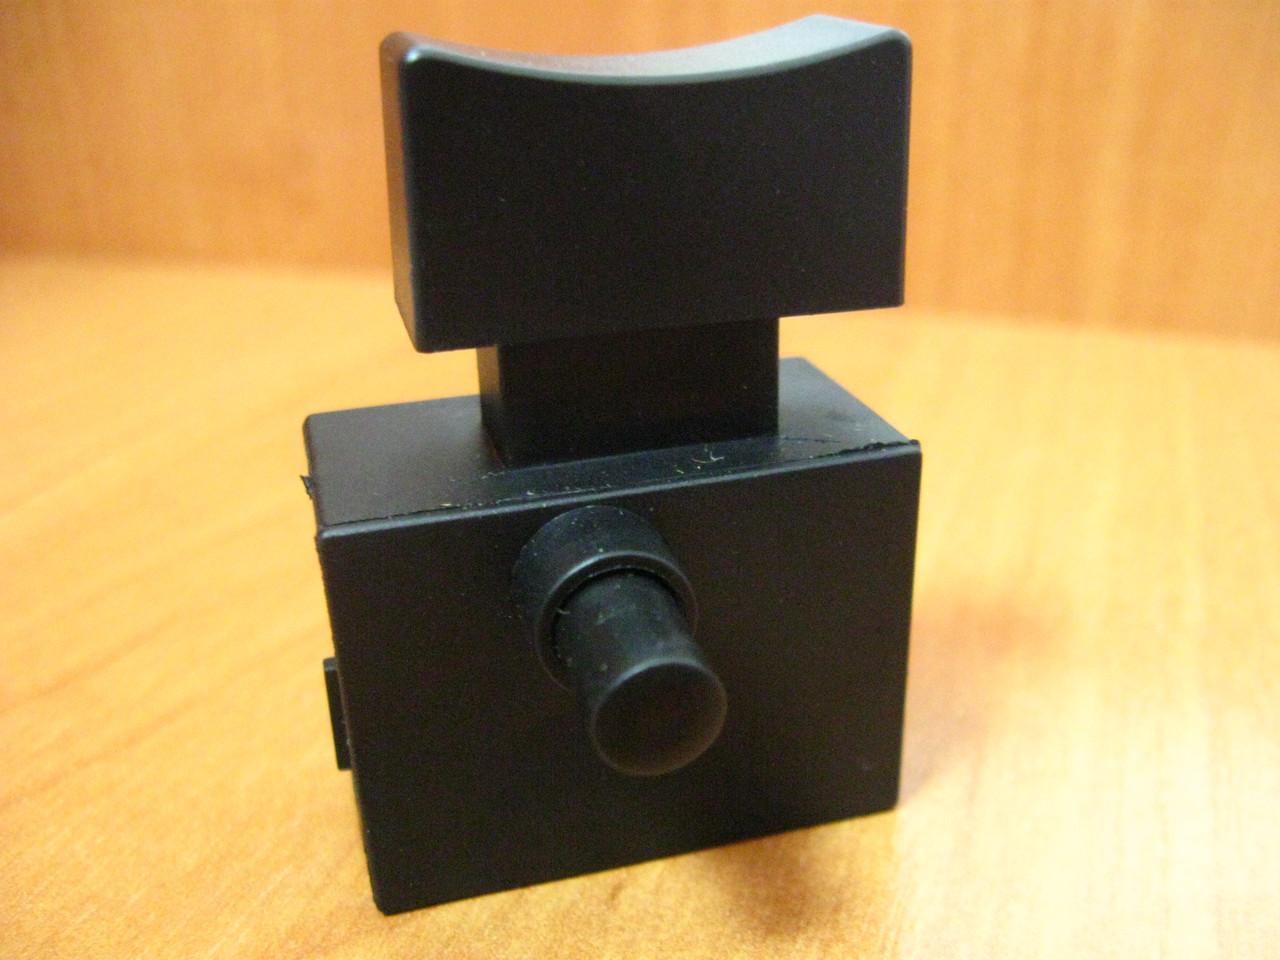 Кнопка болгарки Элпром ЭМШУ-1000-125